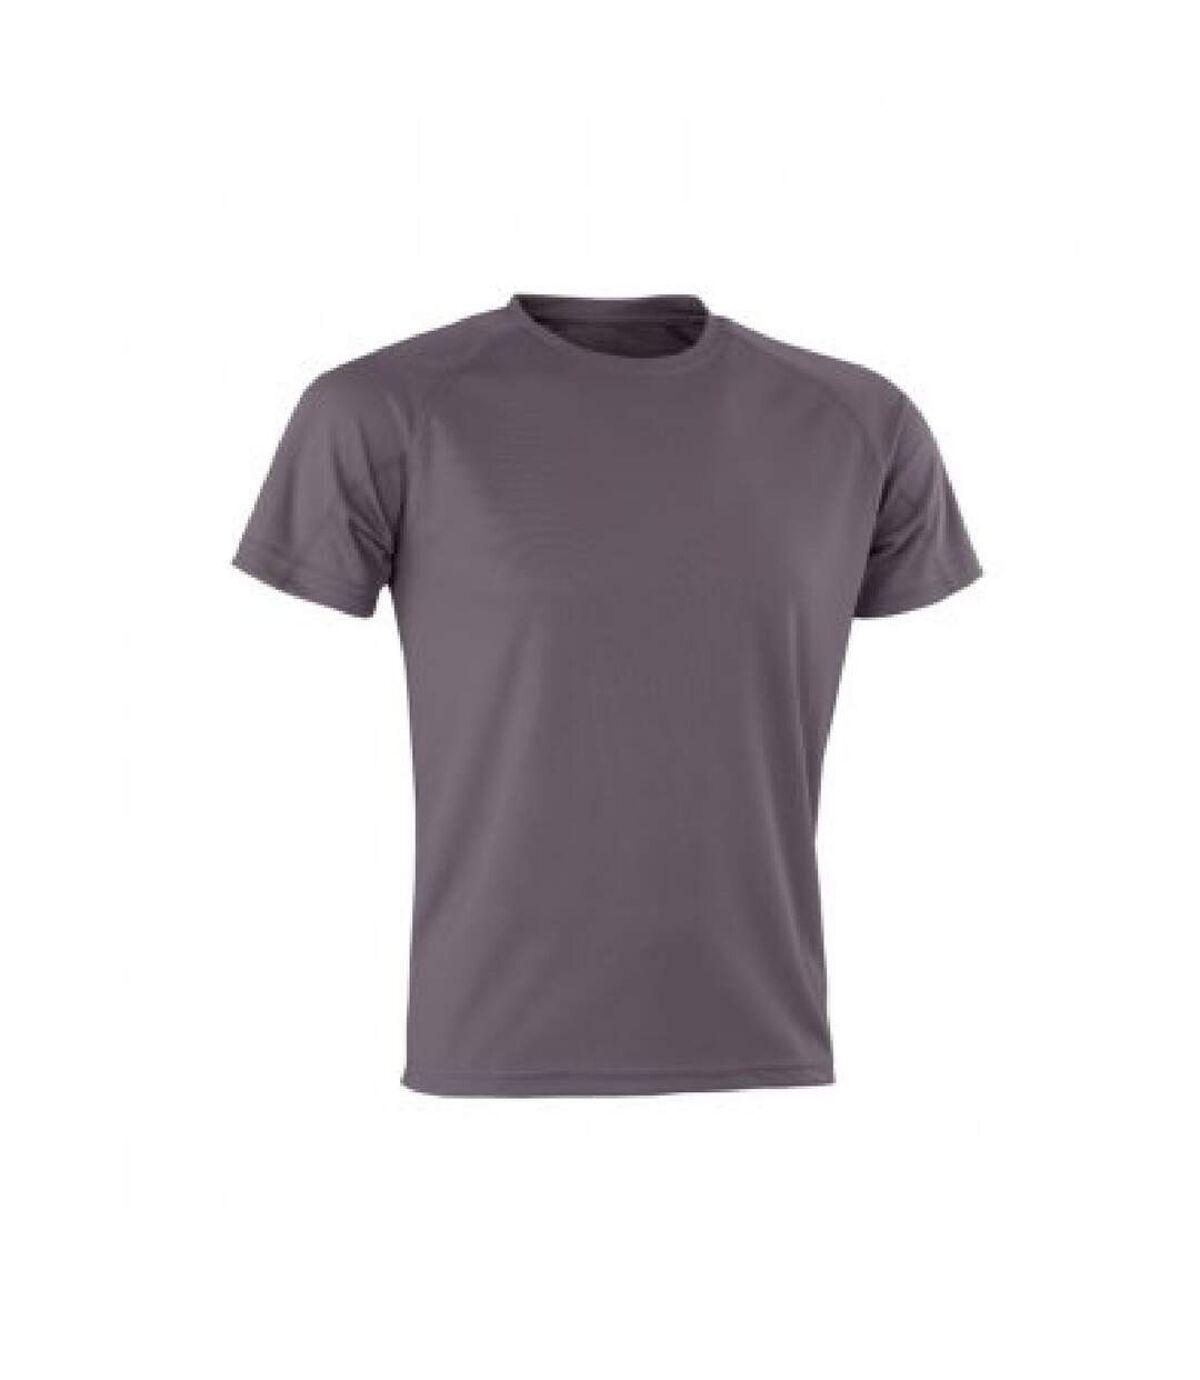 Spiro Mens Aircool T-Shirt (Flo Pink) - UTPC3166